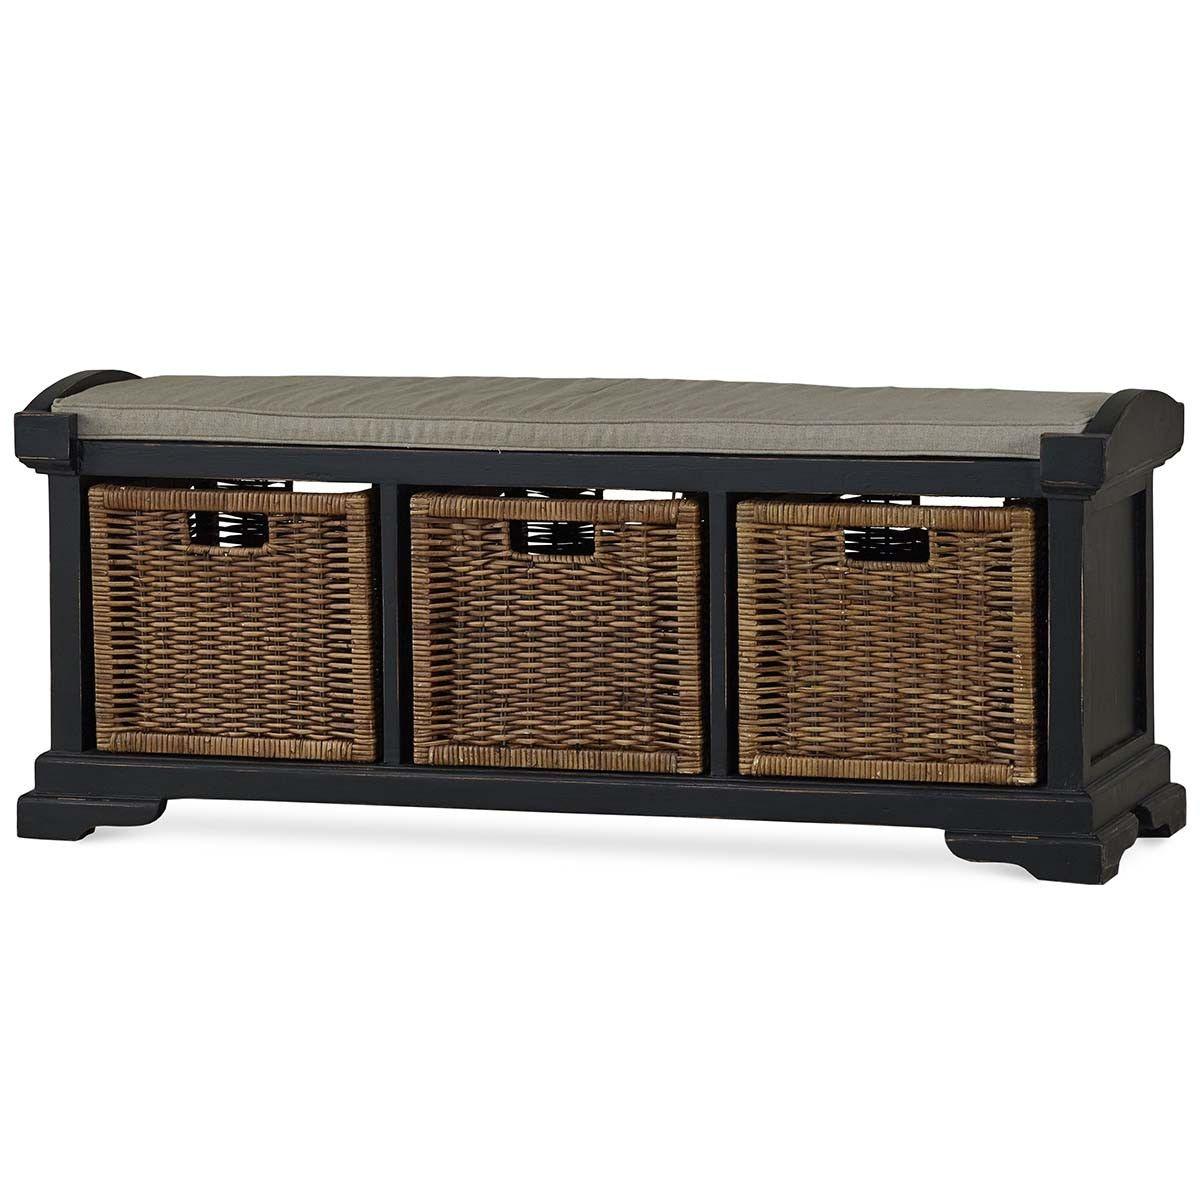 Bramble Homestead Bench With Rattan Baskets 23938